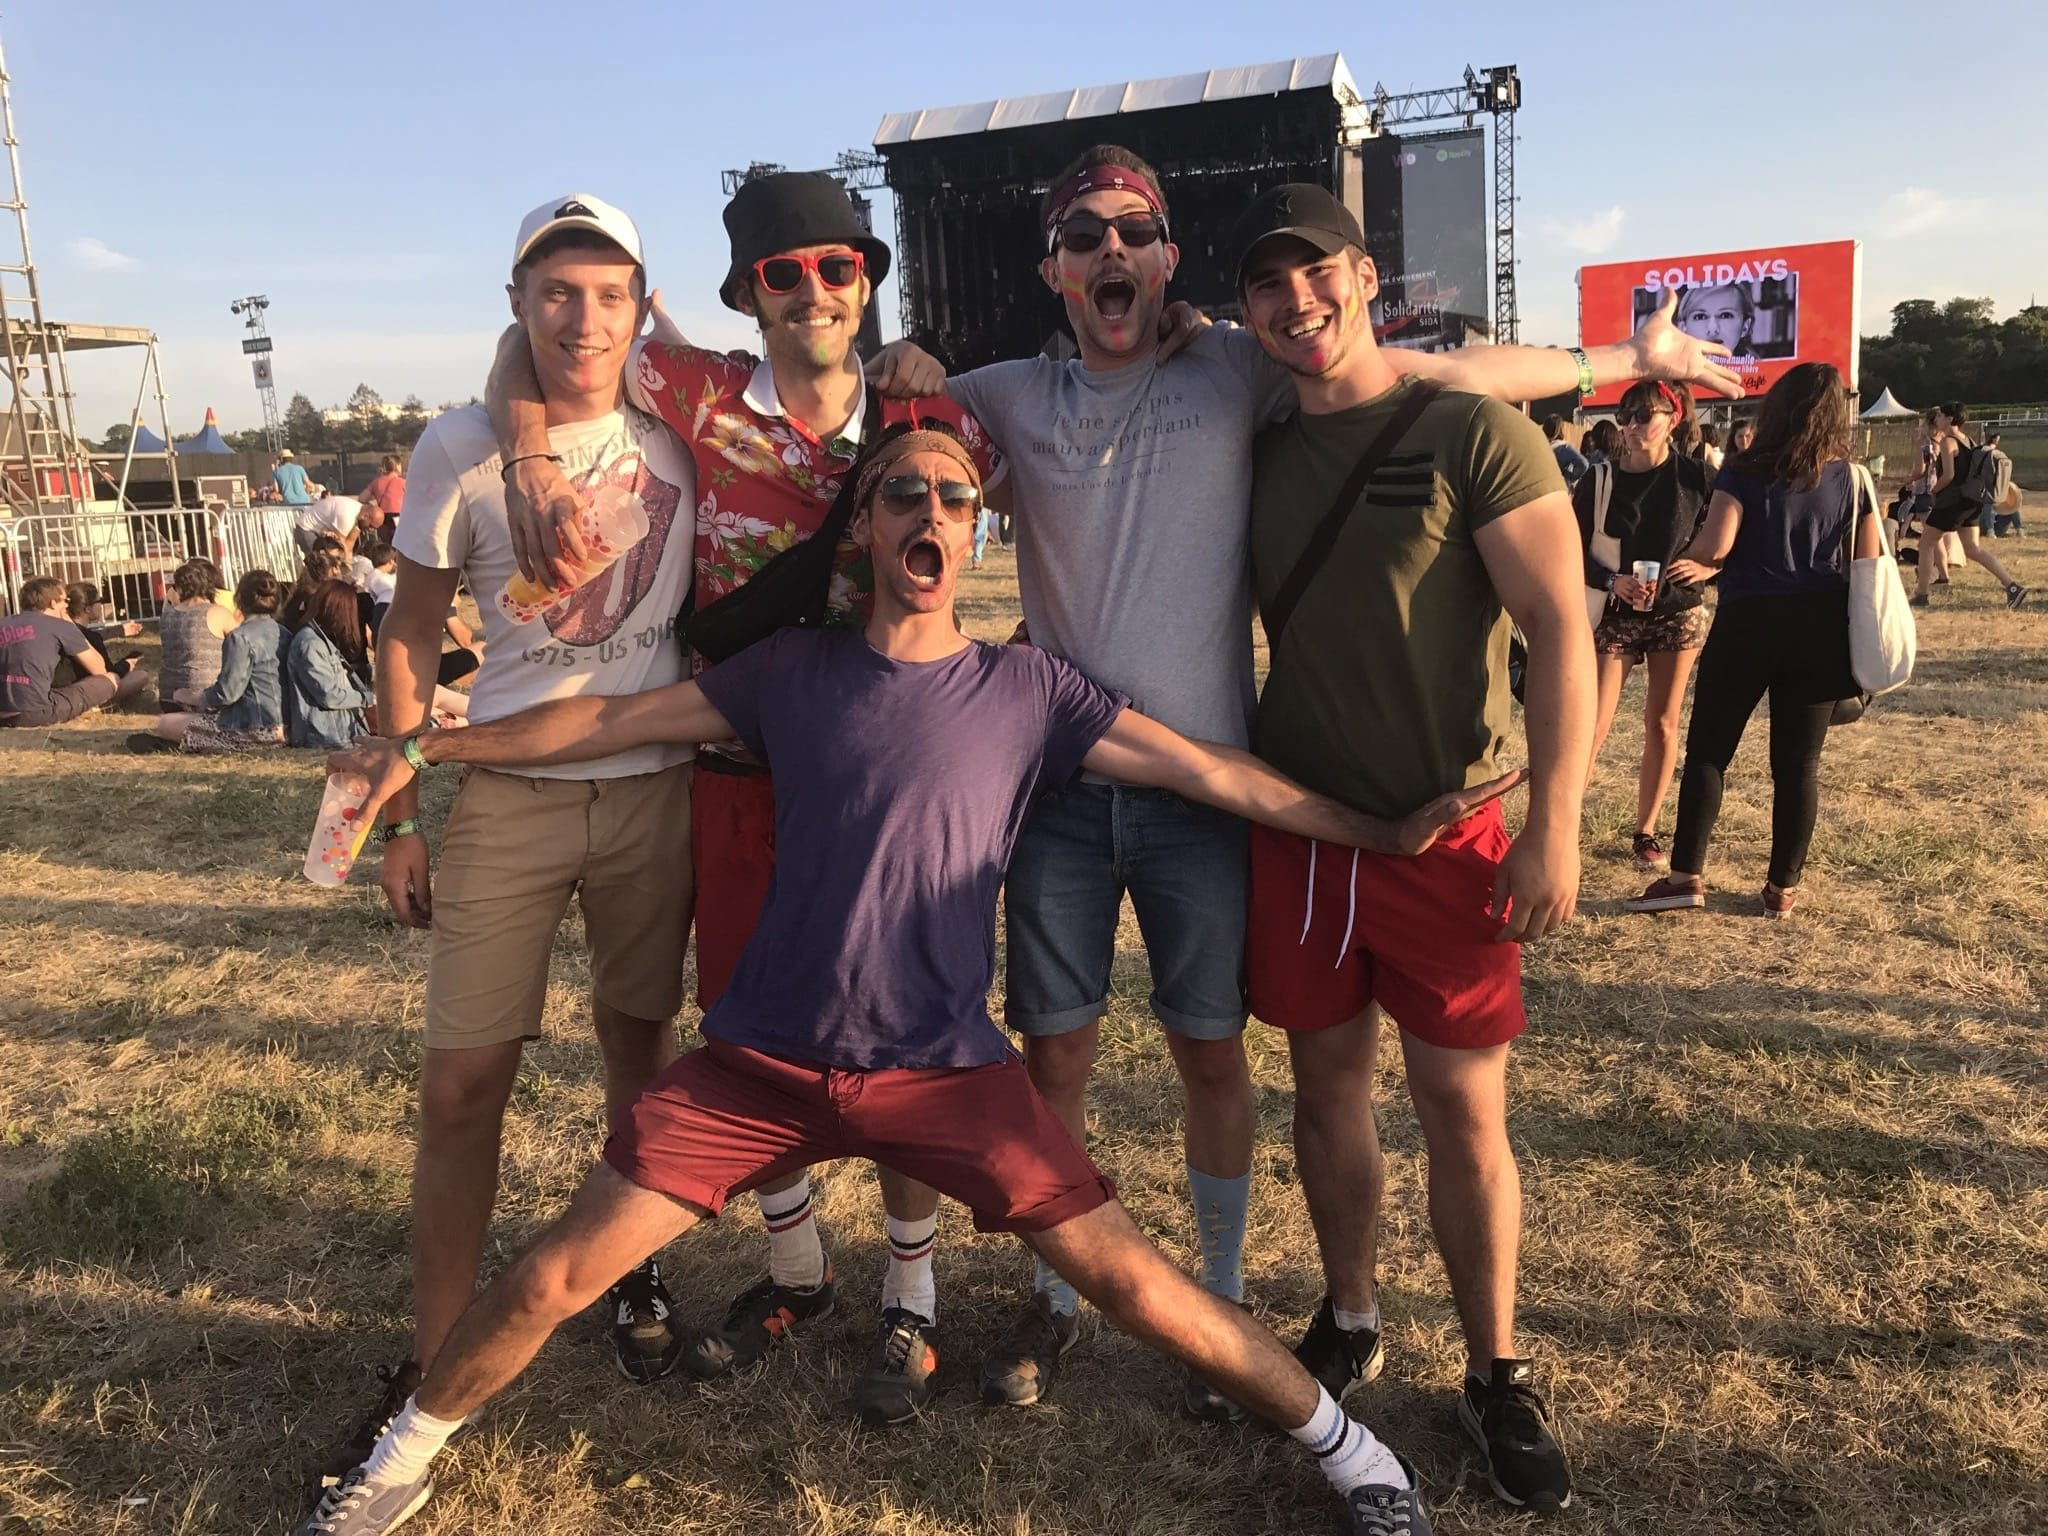 Solidays 2017 festivaliers _2